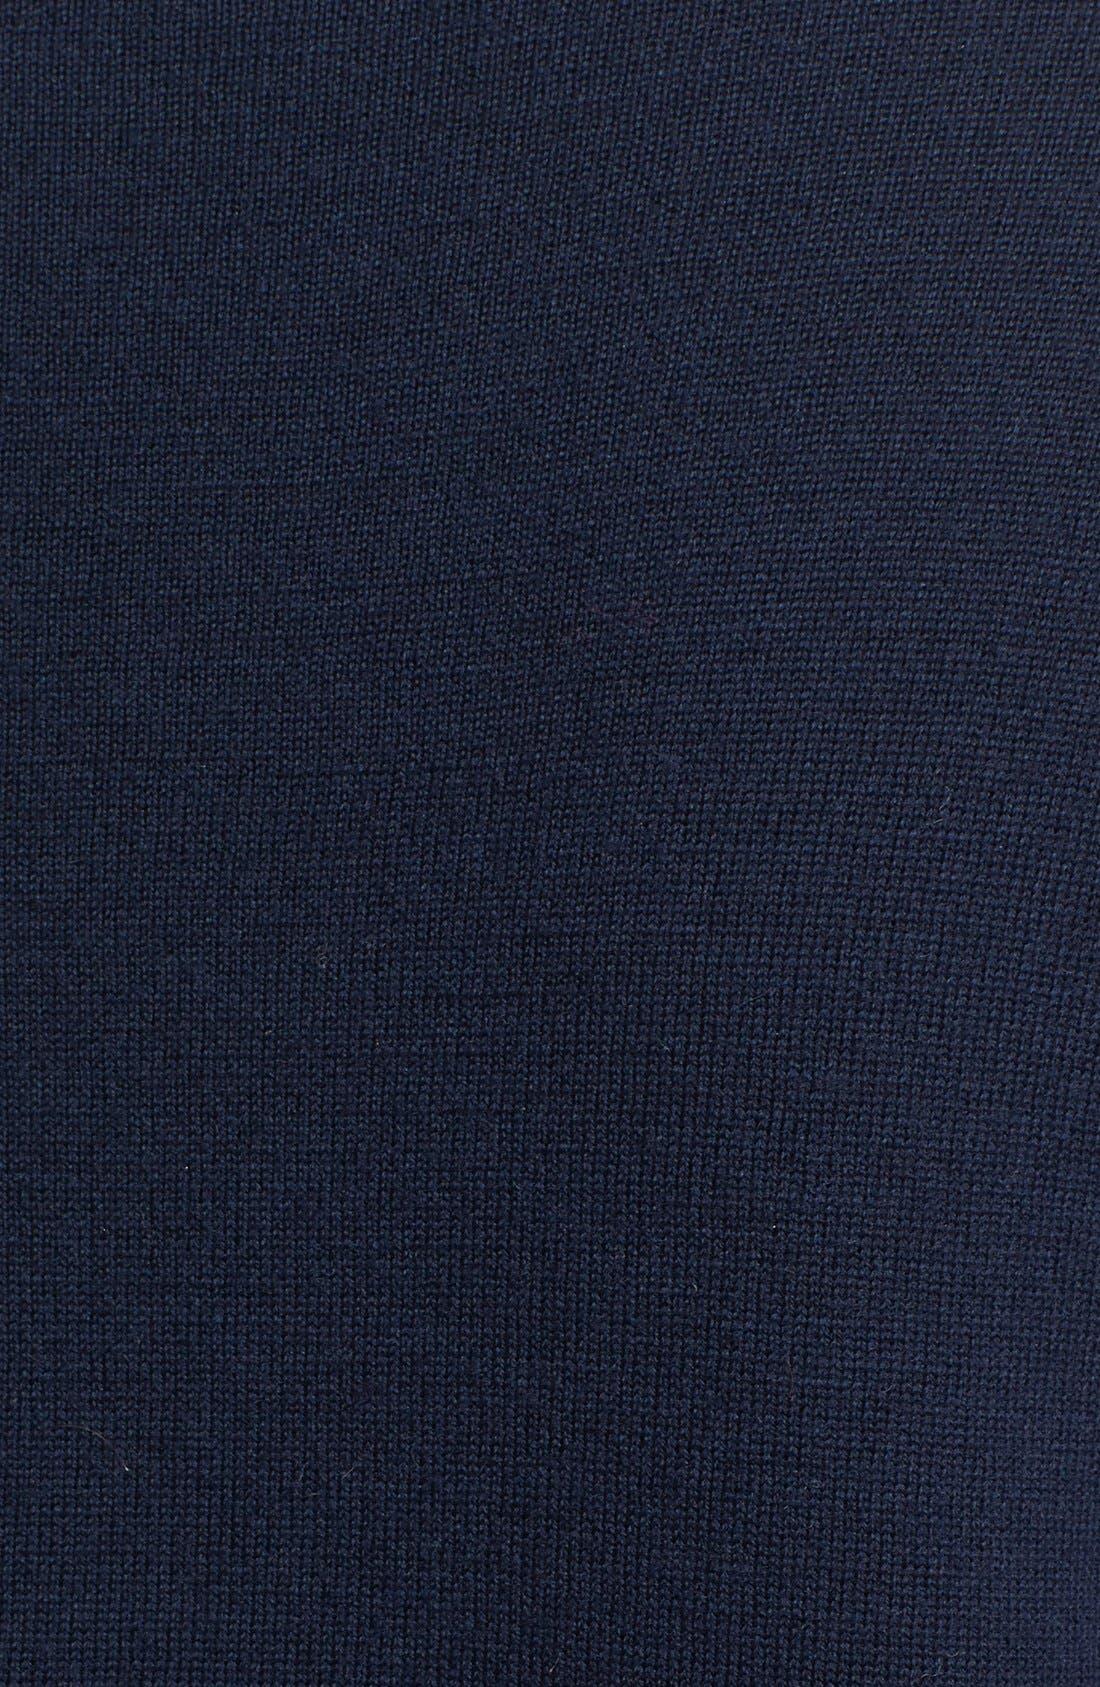 Turtleneck Sweater,                             Alternate thumbnail 4, color,                             402